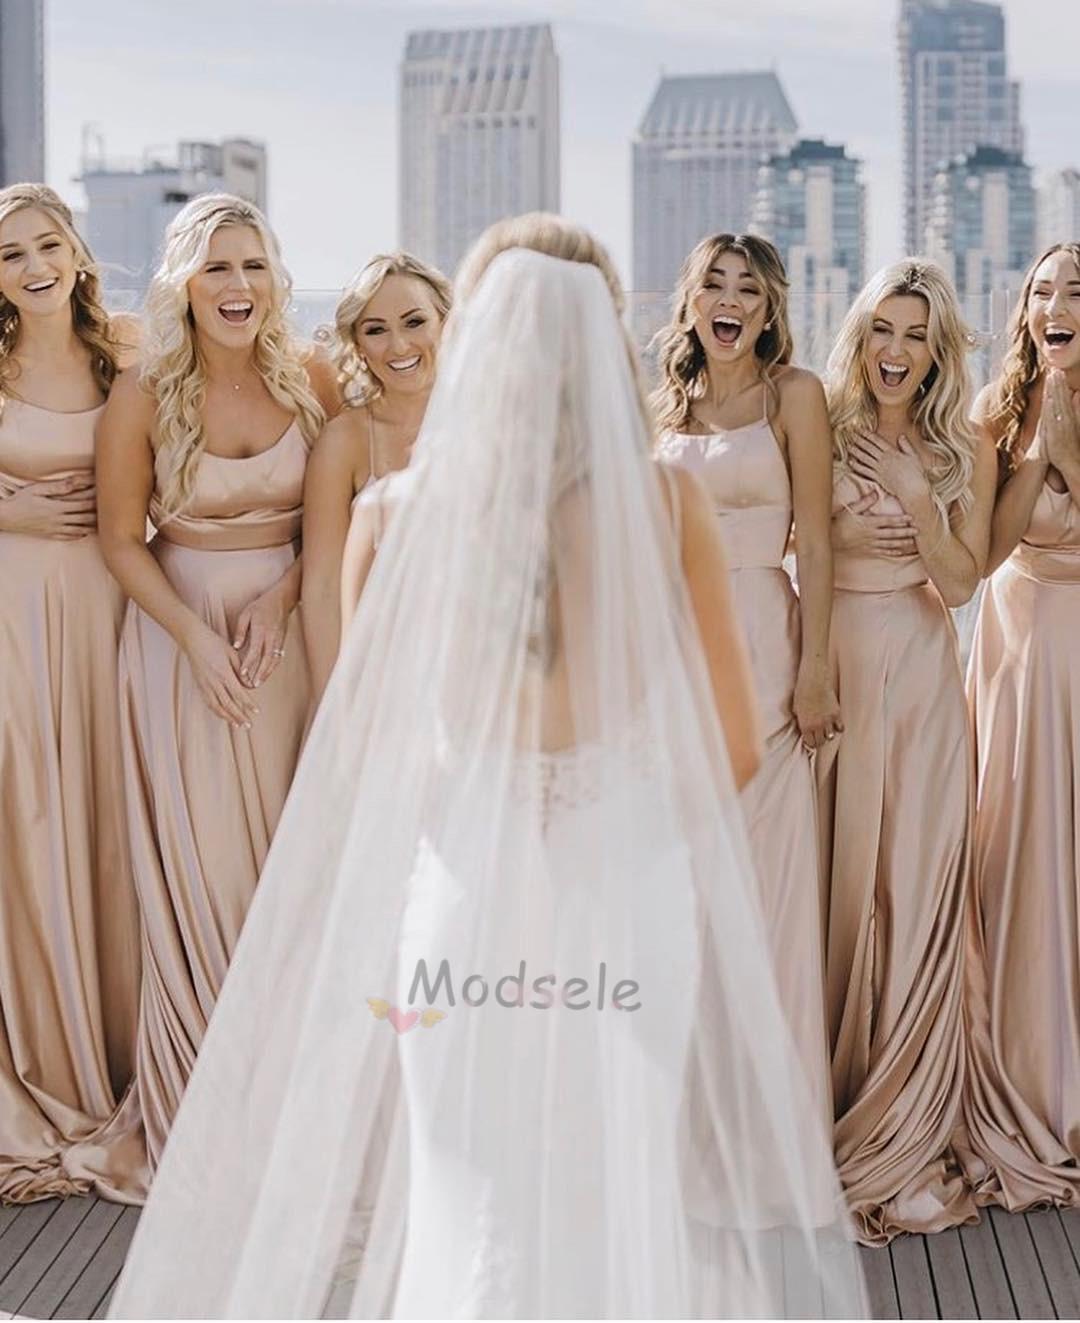 7e38a4ae046d Simple Peach Long Bridesmaid Dress · modsele · Online Store Powered ...